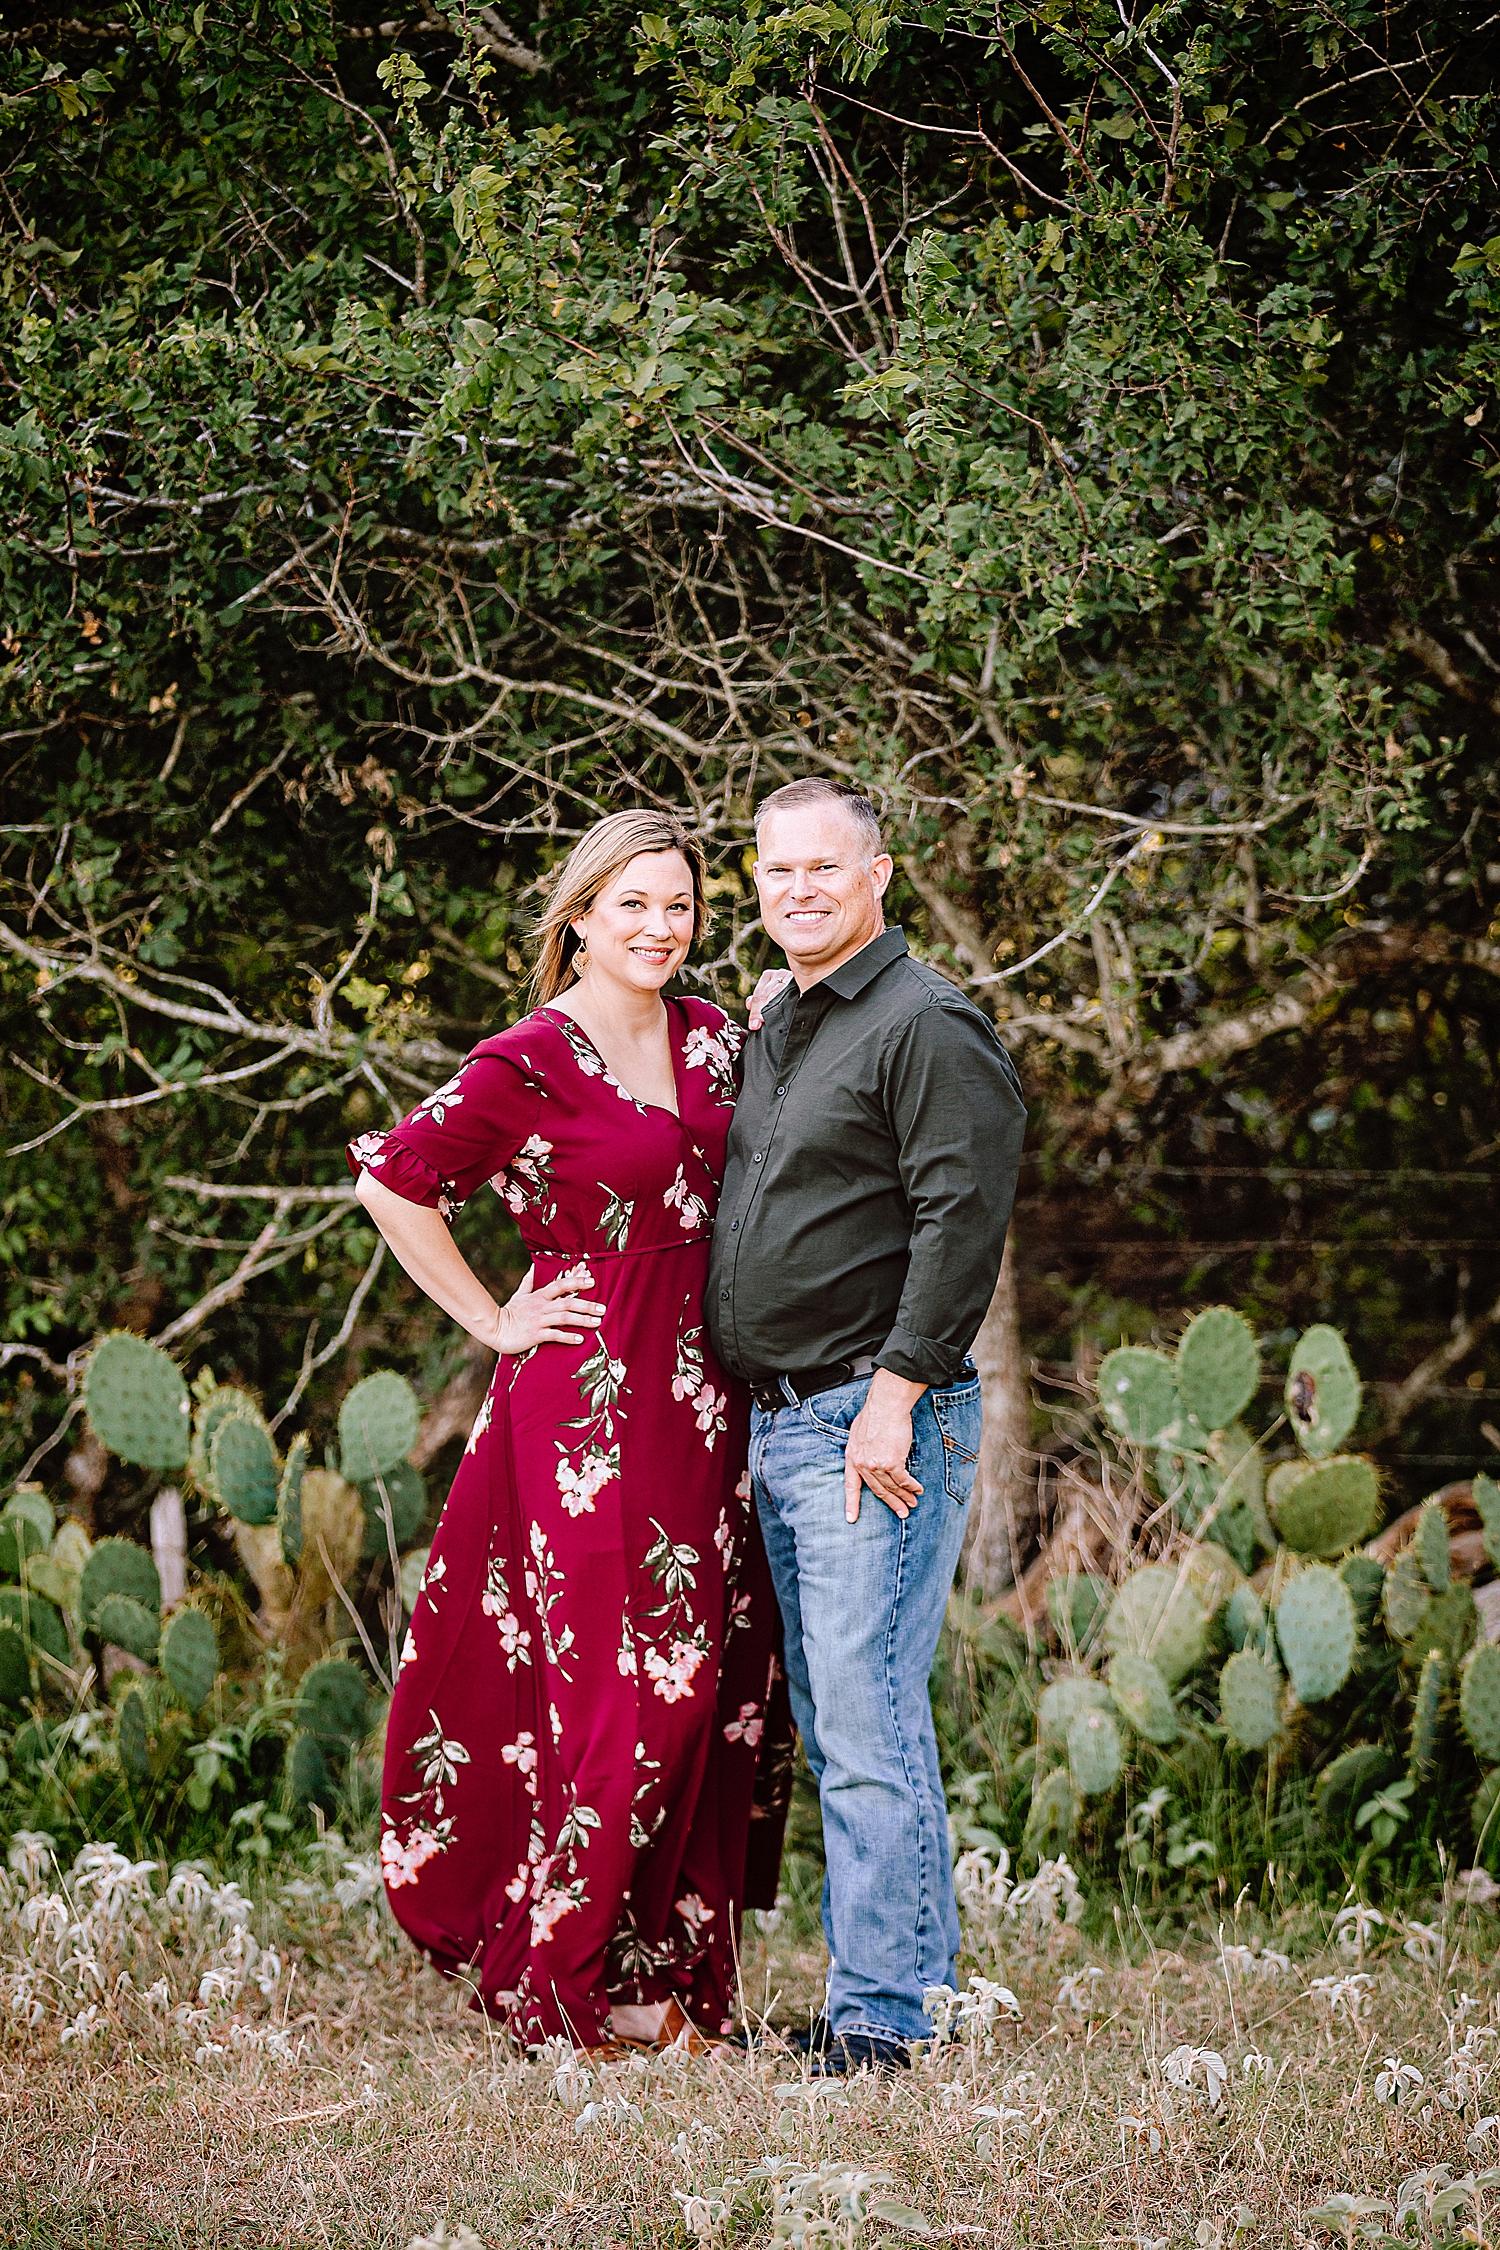 Carly-Barton-Photography-La-Vernia-Texas-Engagement-Photos-Sunset_0024.jpg